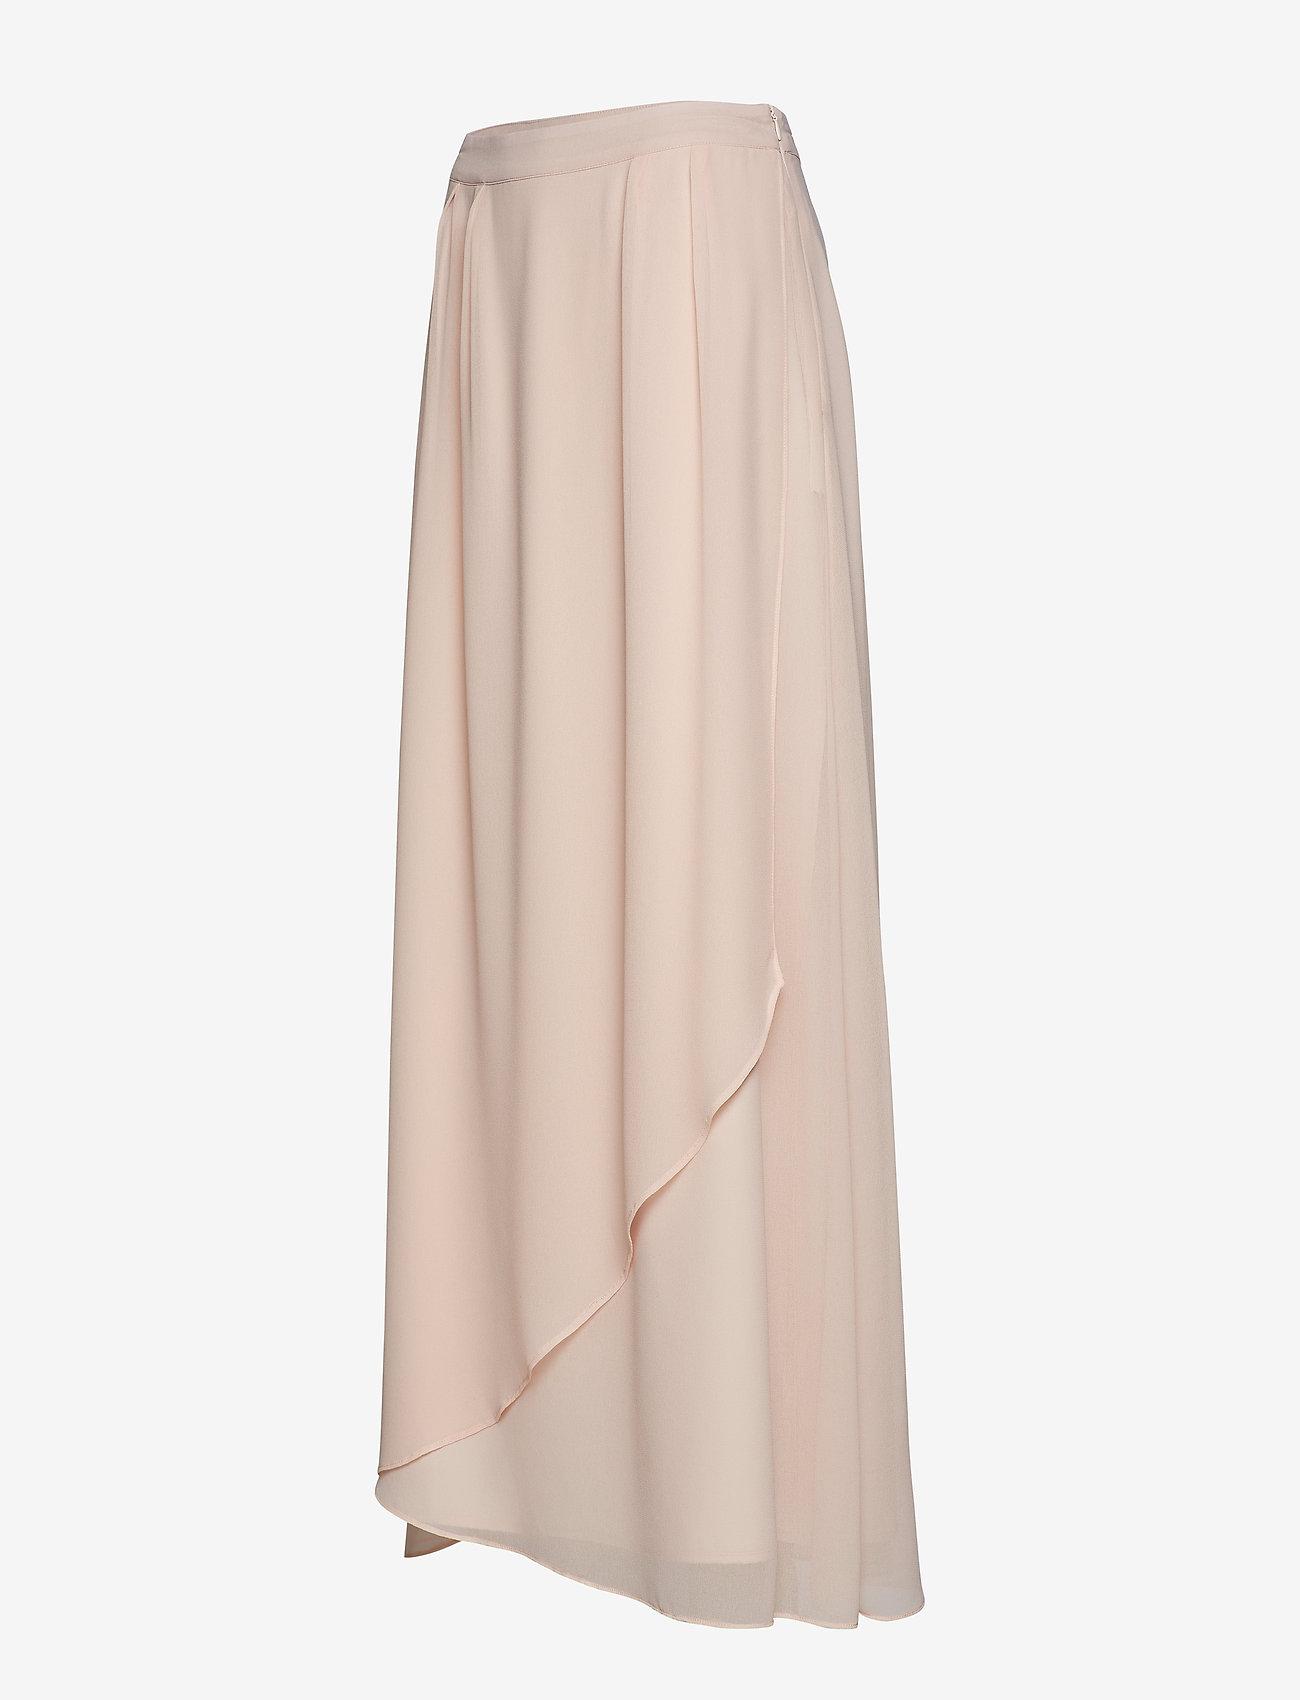 Esprit Collection - Skirts light woven - midi skirts - light pink - 1